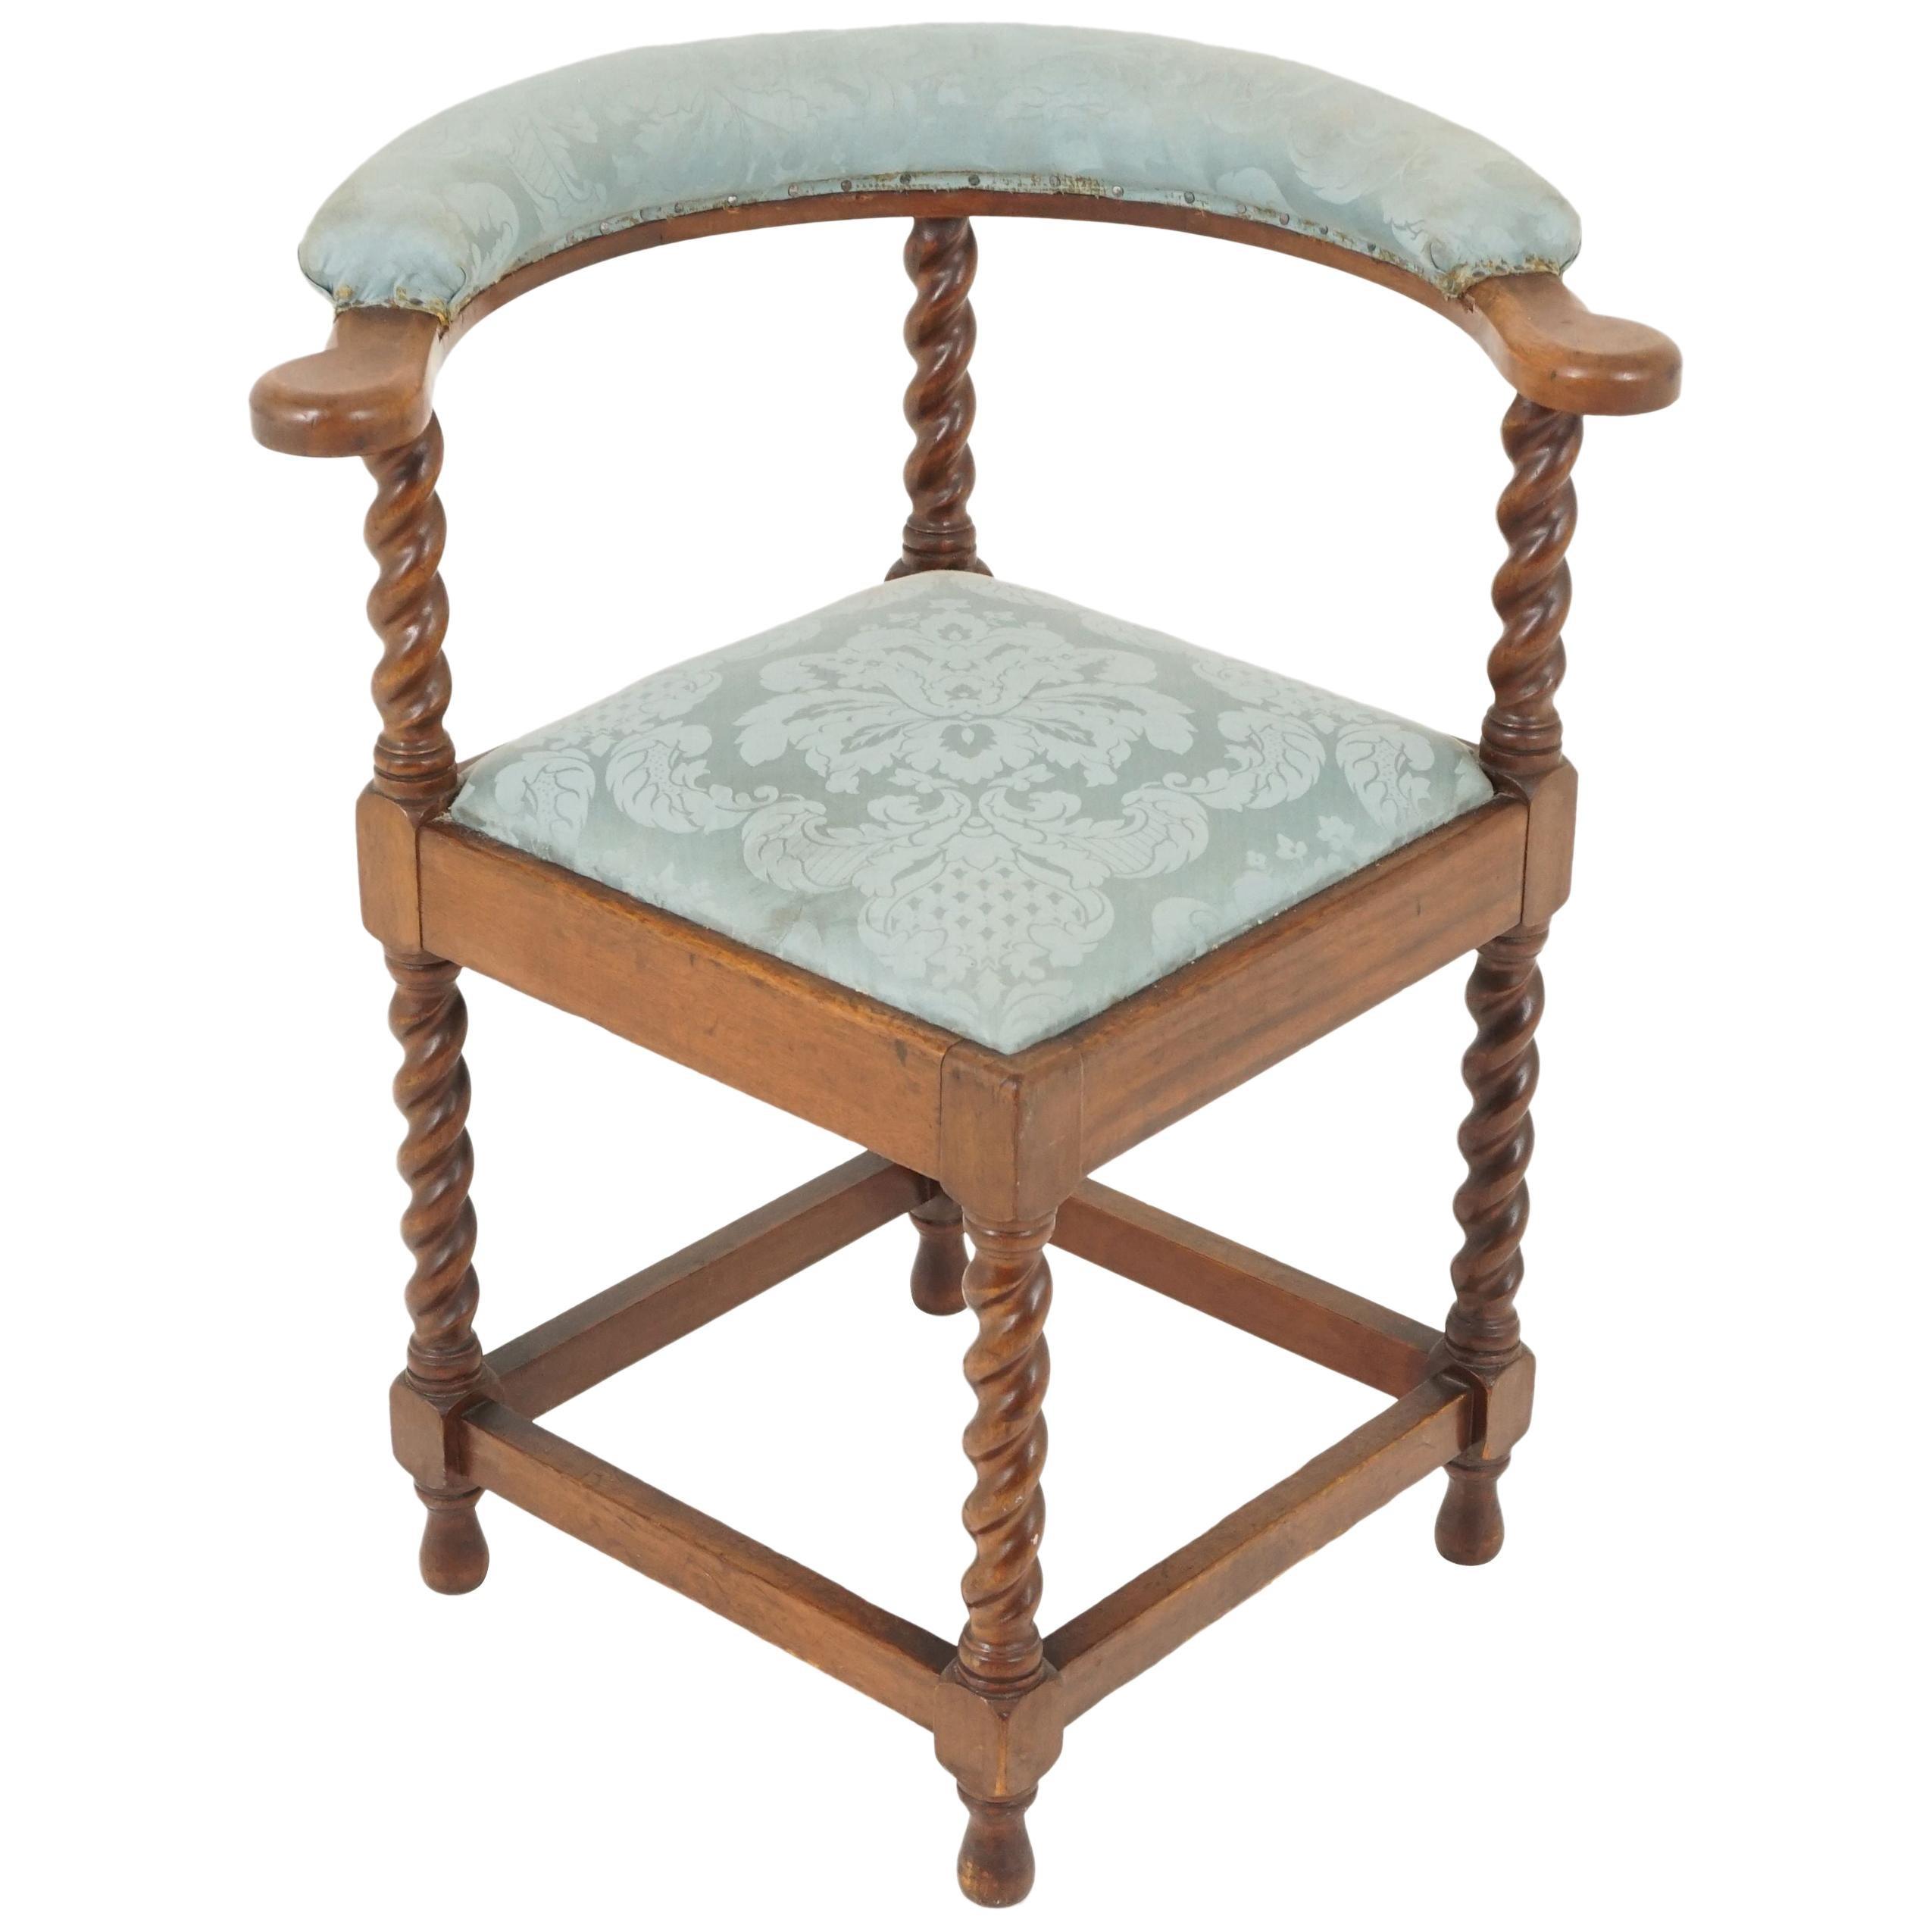 Antique Barley Twist Oak Corner Occasional Chair, Scotland 1920, B2378